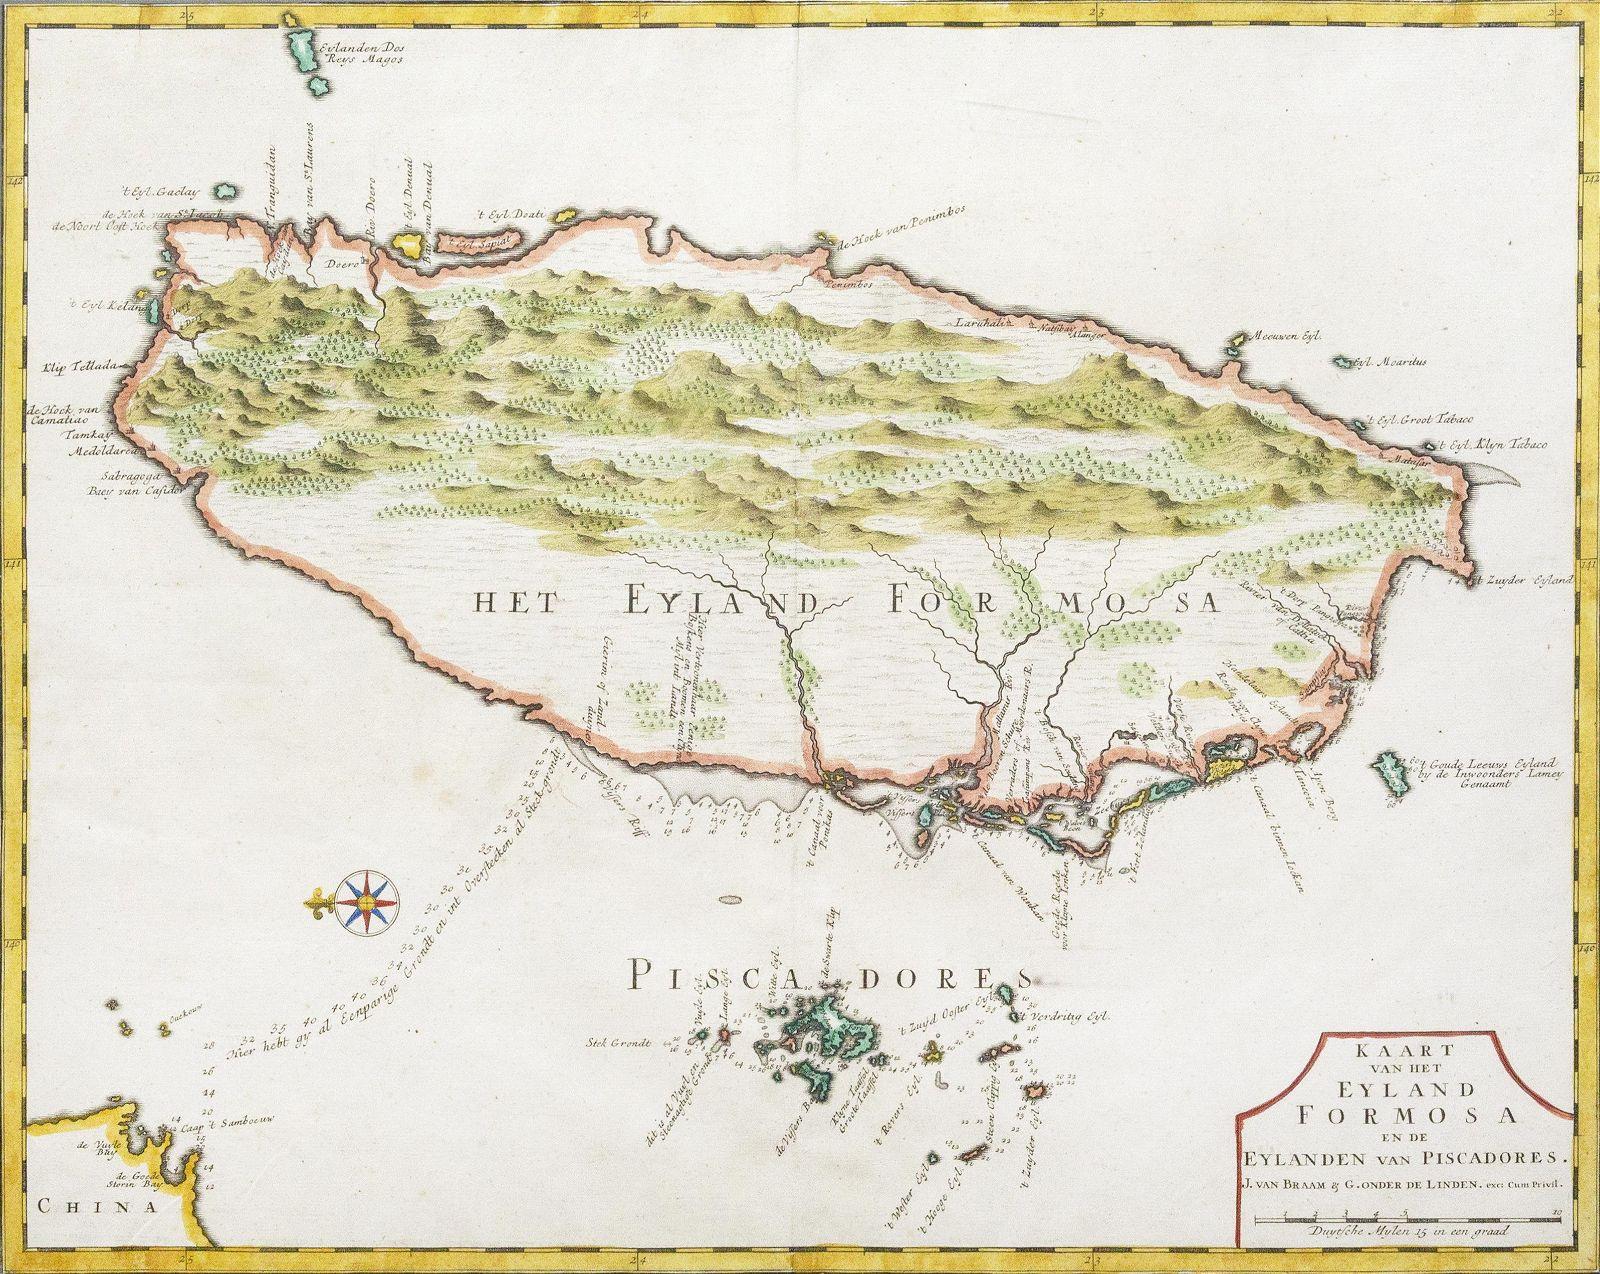 Valentijn Map of Forma (Taiwan)